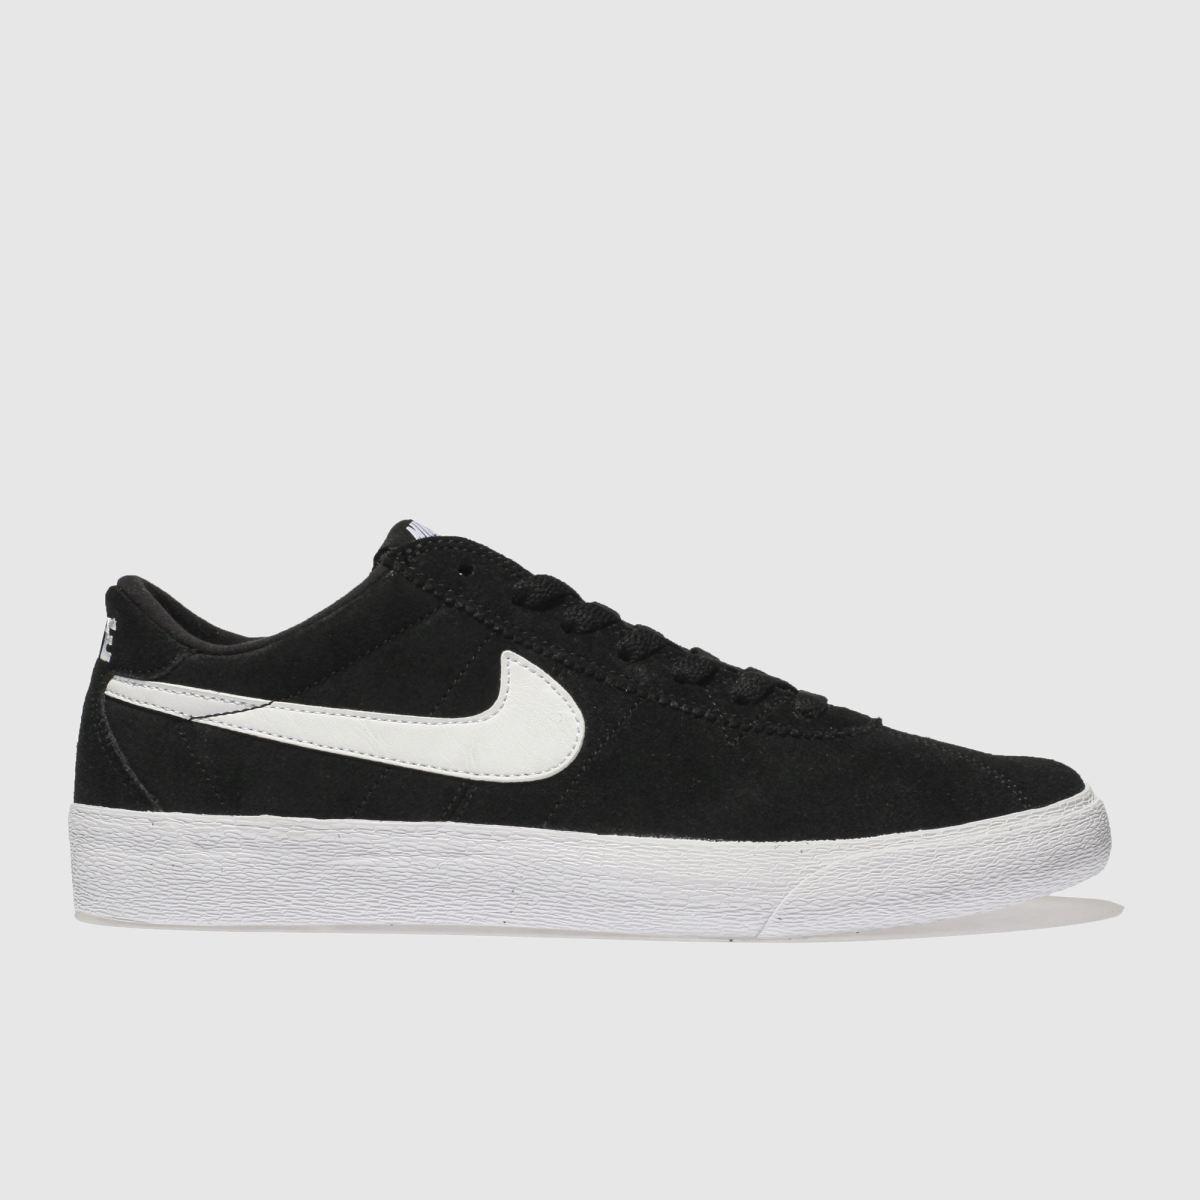 Nike Sb Black & White Bruin Low Trainers